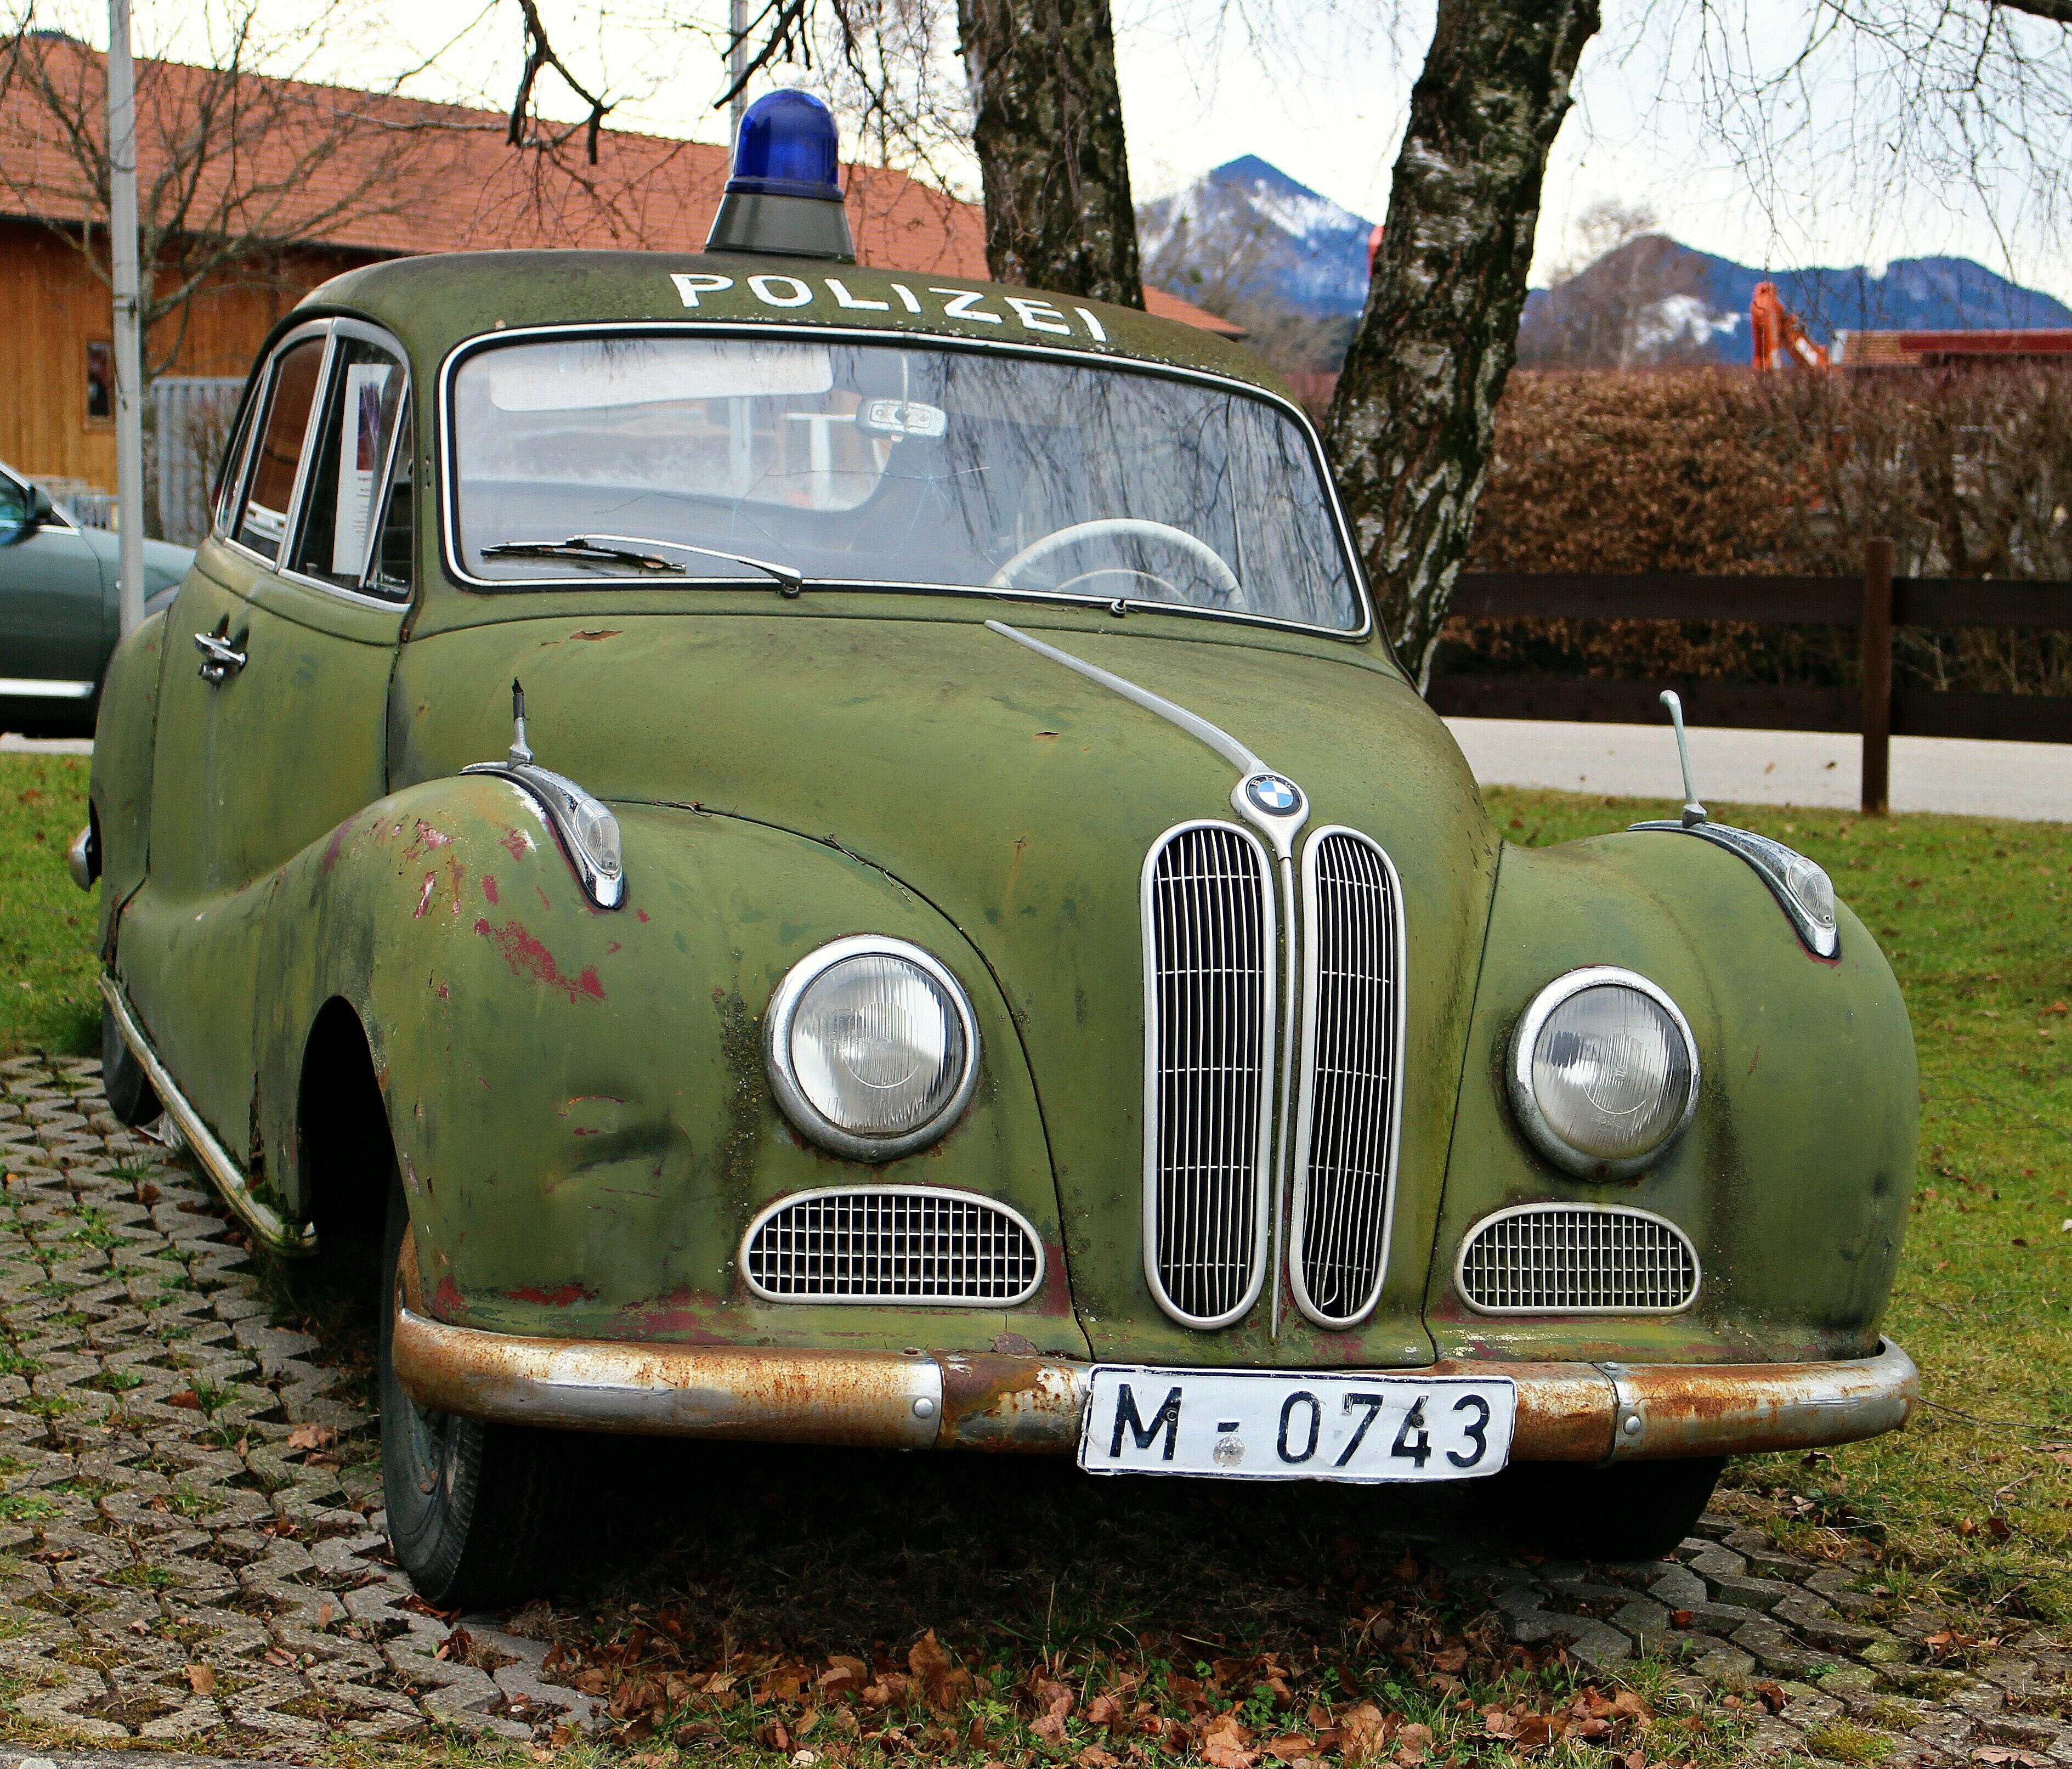 Bmw 501 Green Oldtimer Police Car Free Image